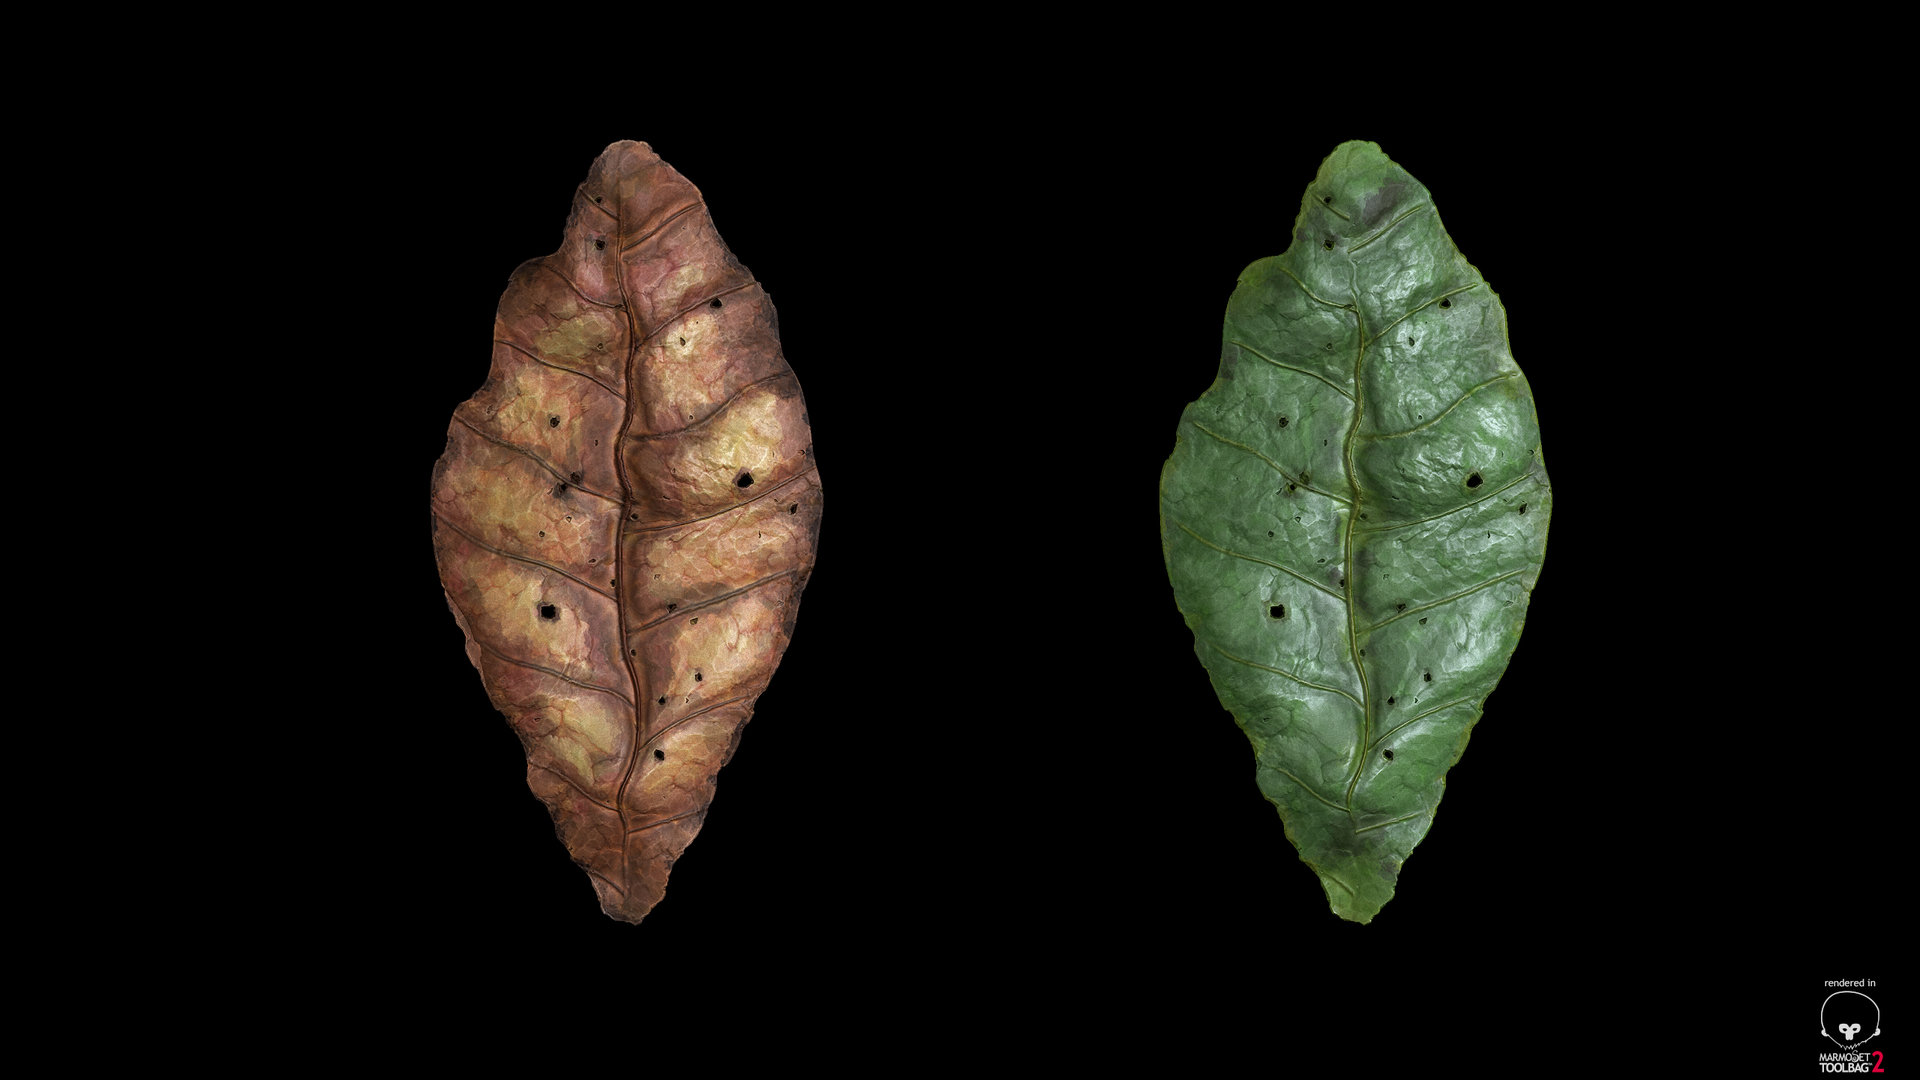 sebastian-schade-leaf4.jpg?1436909621